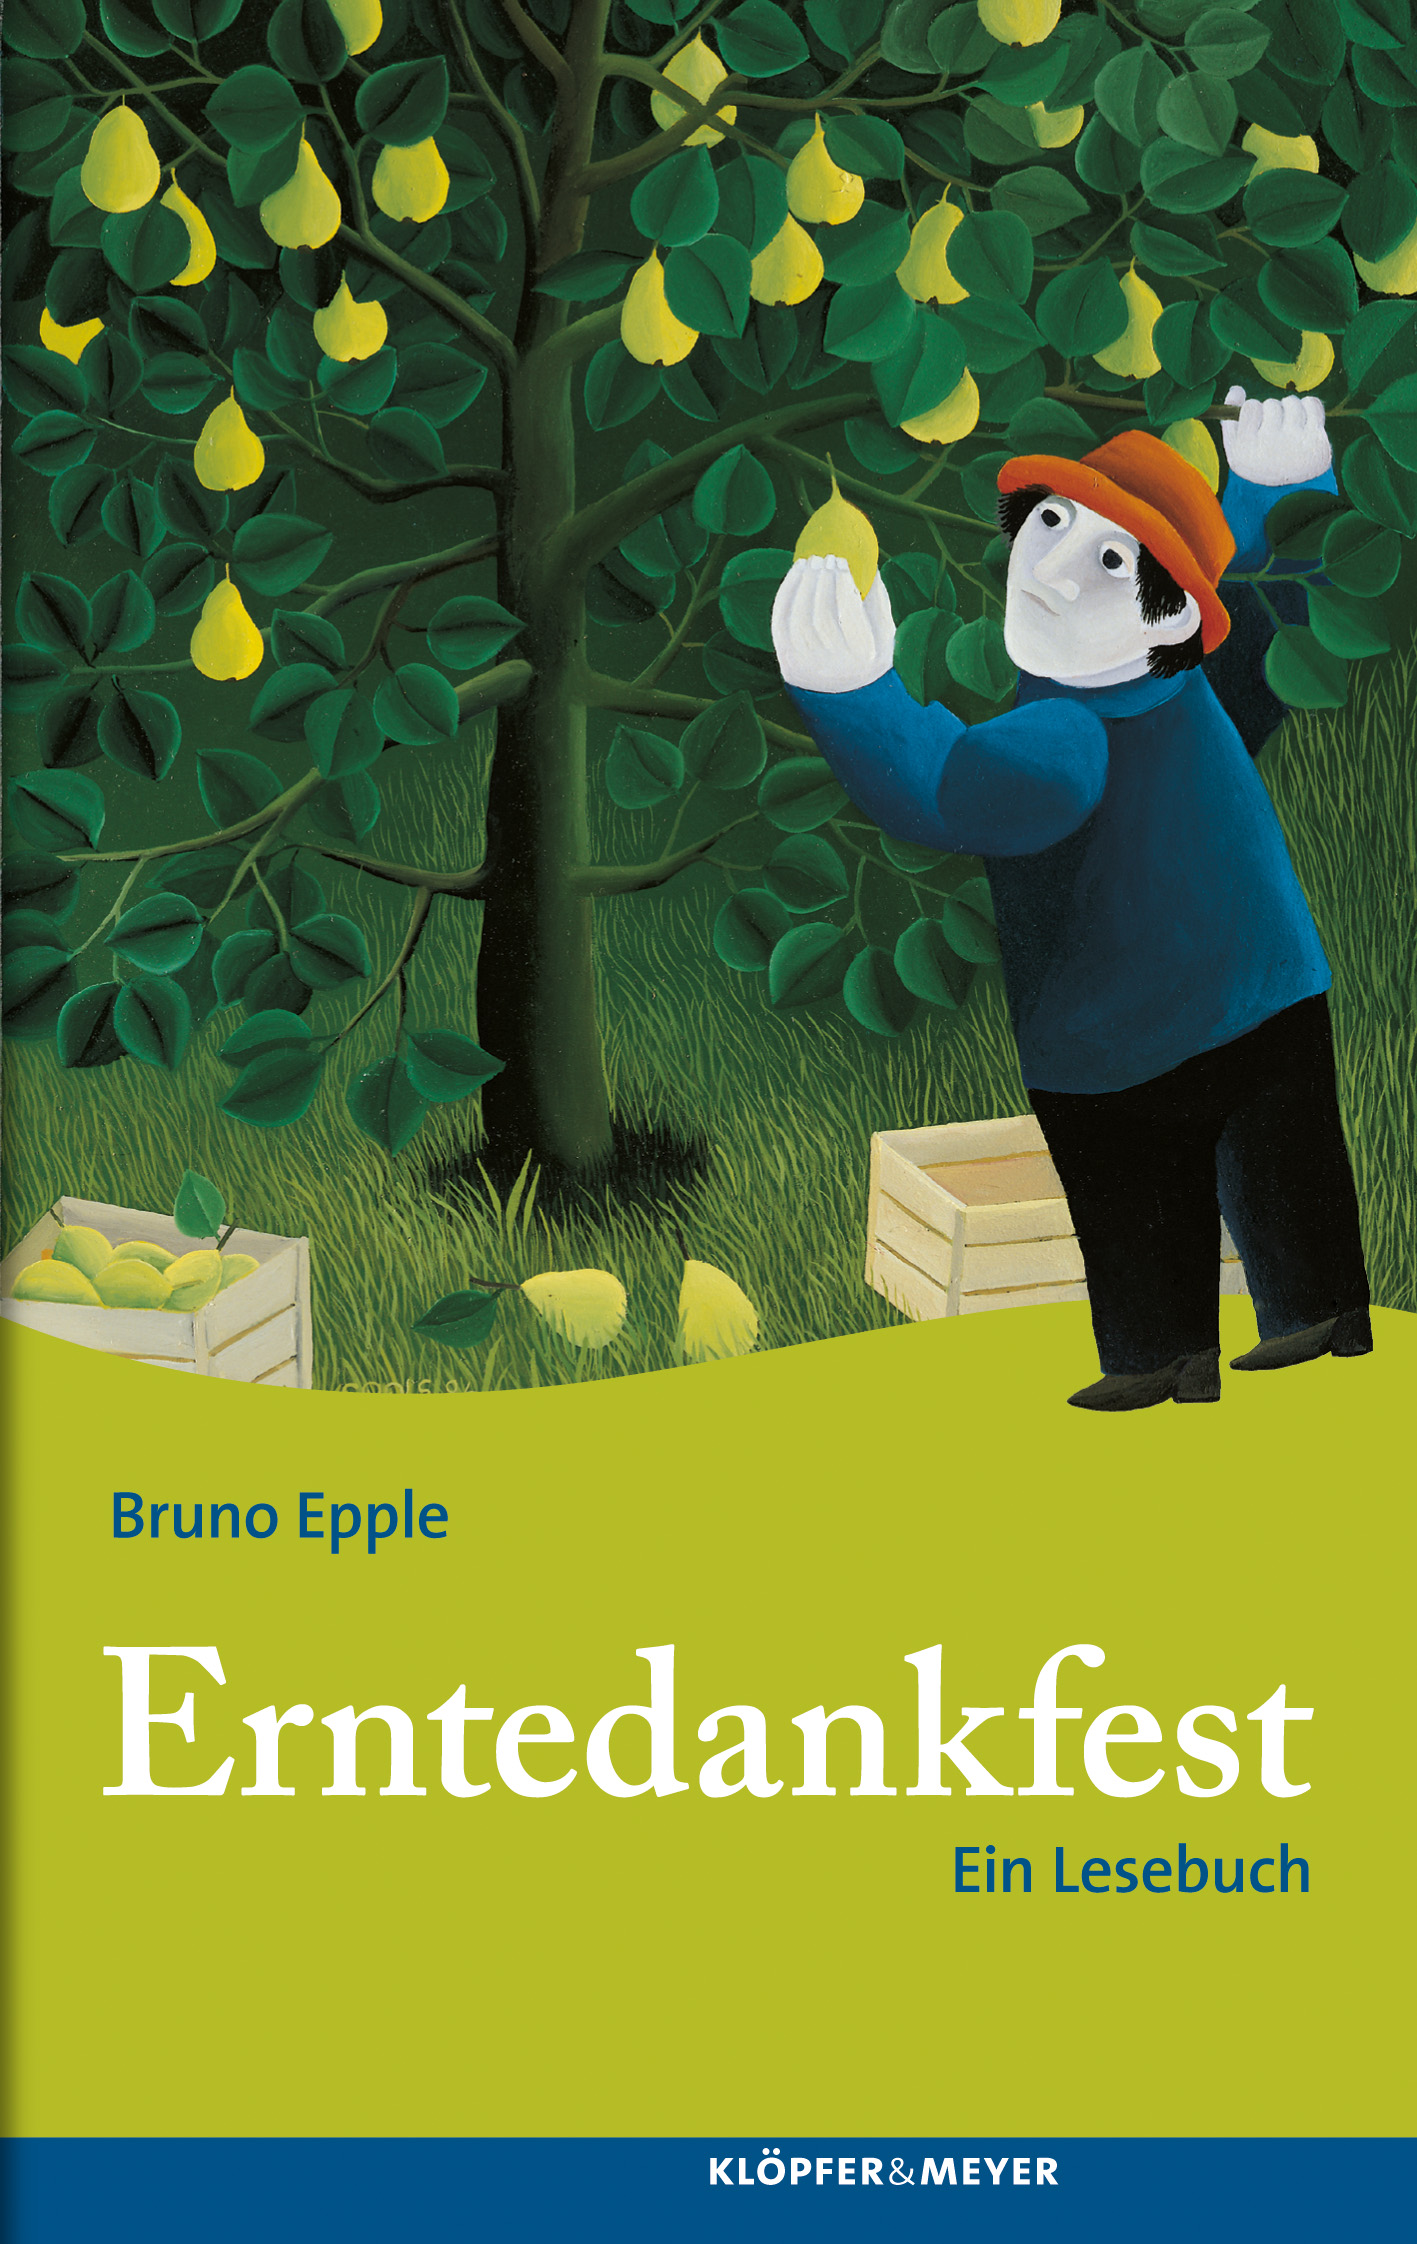 Erntedankfest Bruno Epple